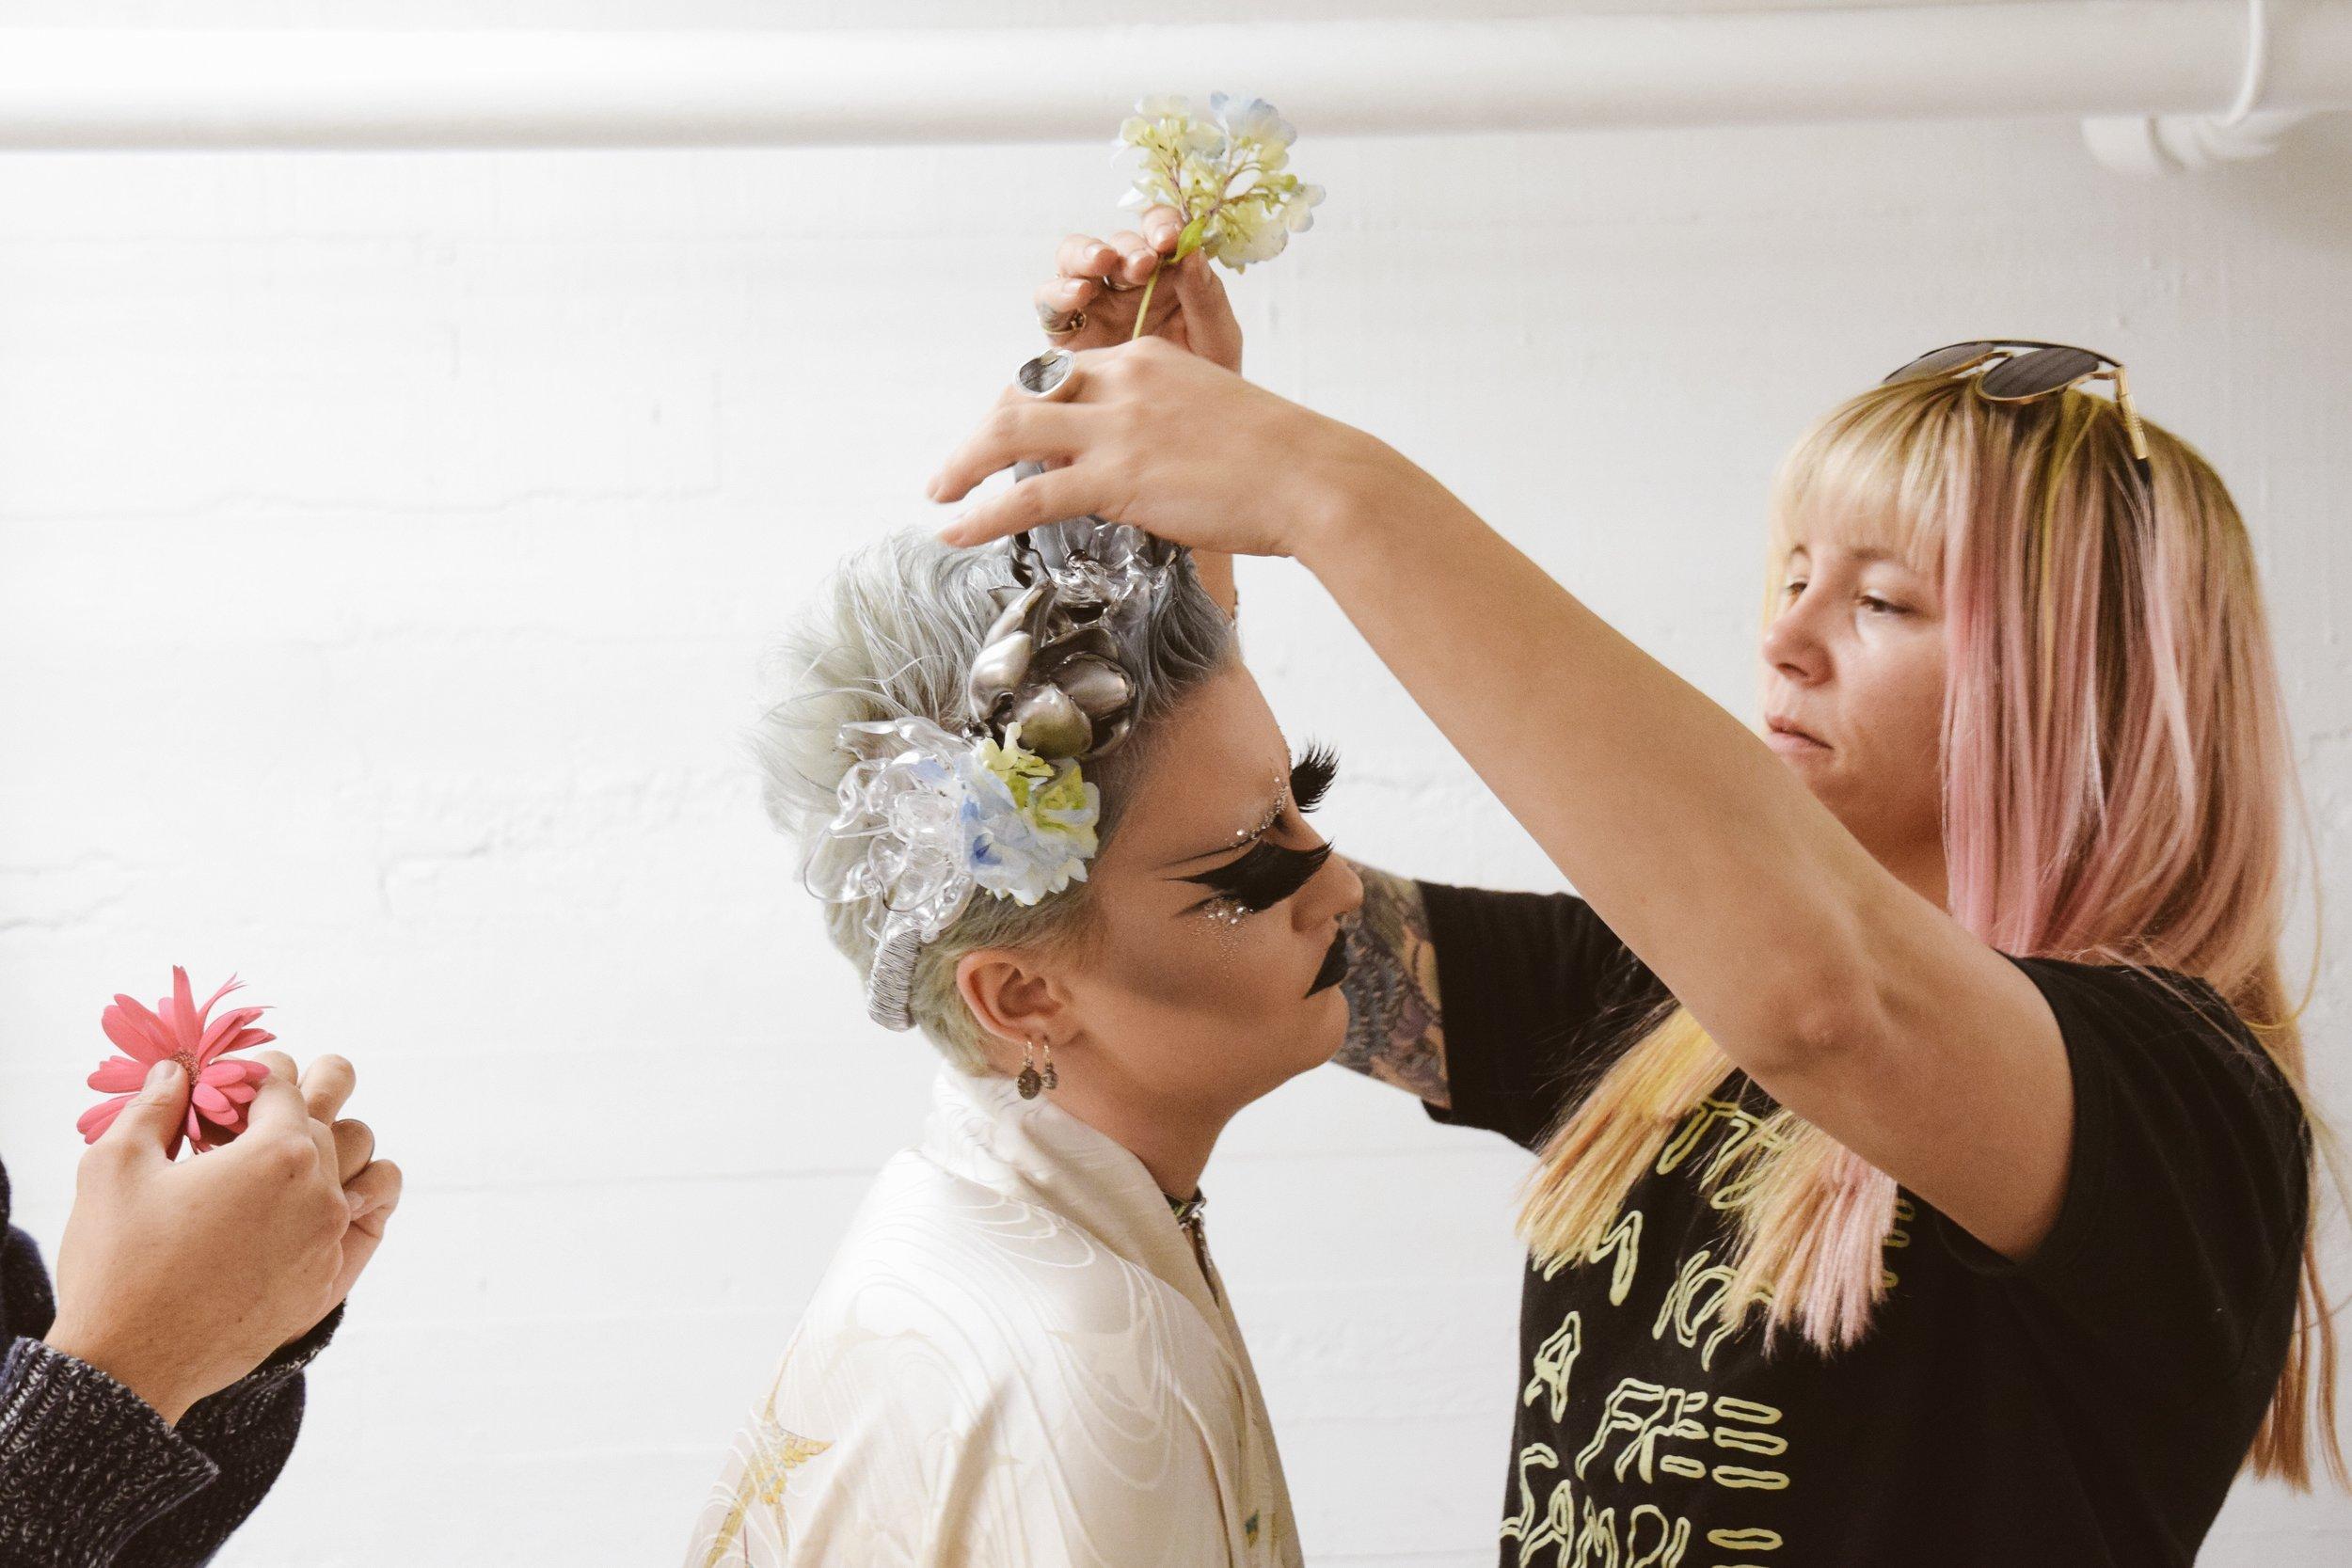 Landra Dulin styling Mikayla Gottleib for her shot